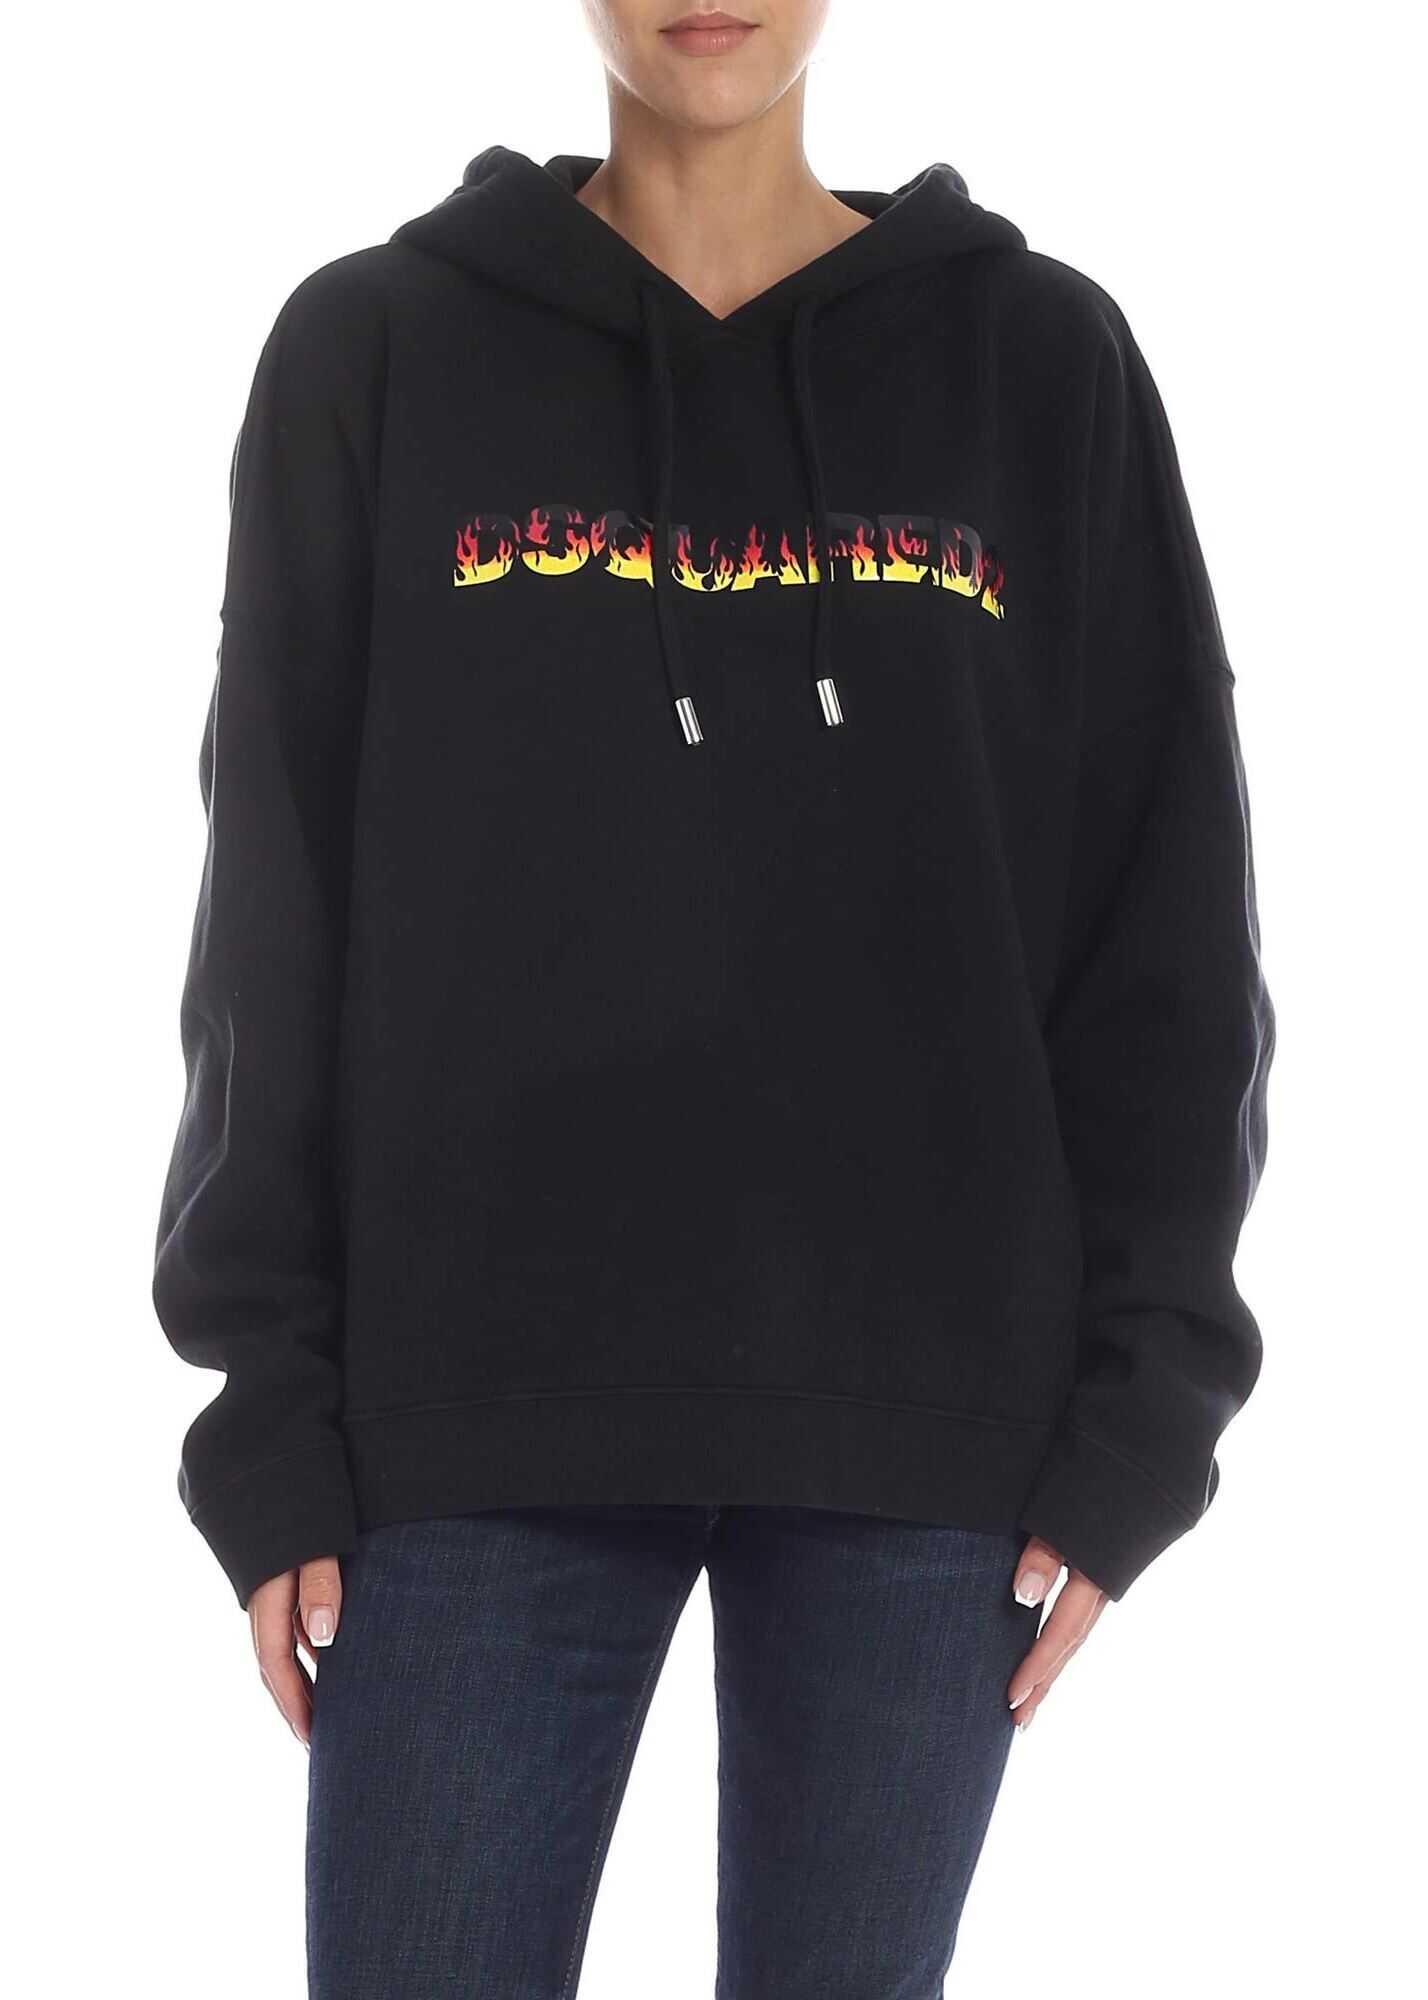 DSQUARED2 Black Sweatshirt With Logo Print Black